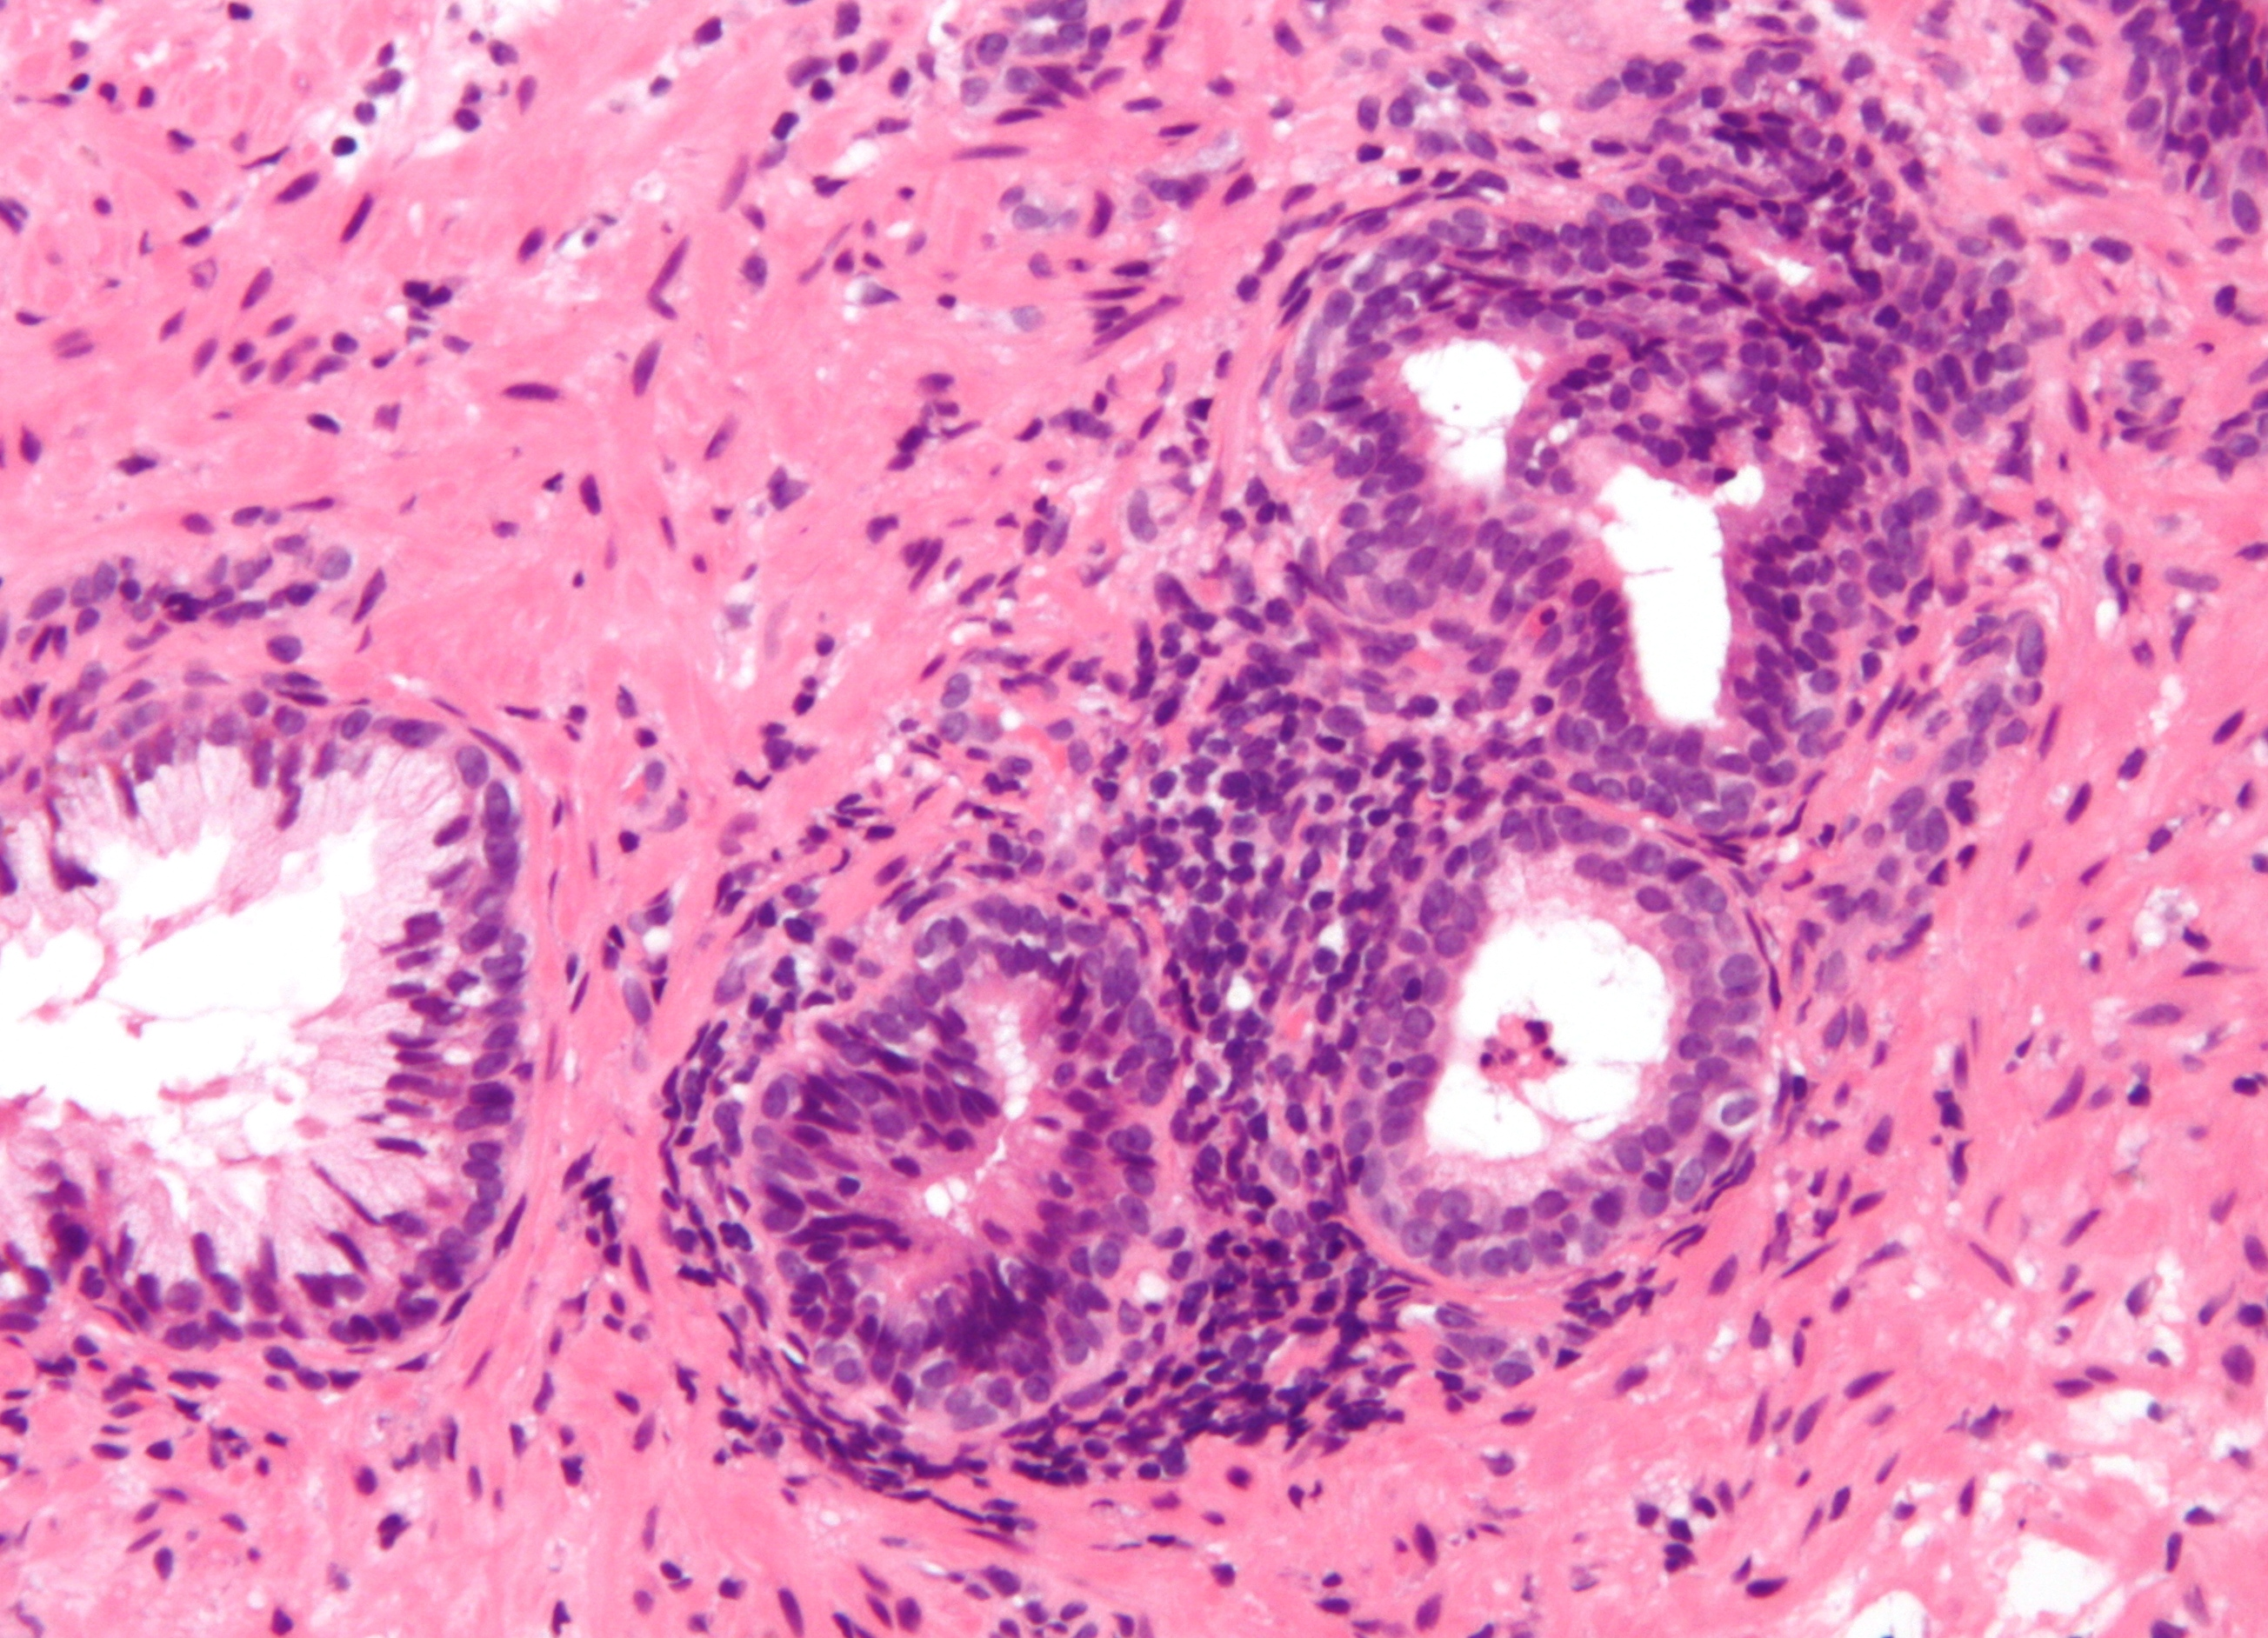 Prostate cancer liver function tests results